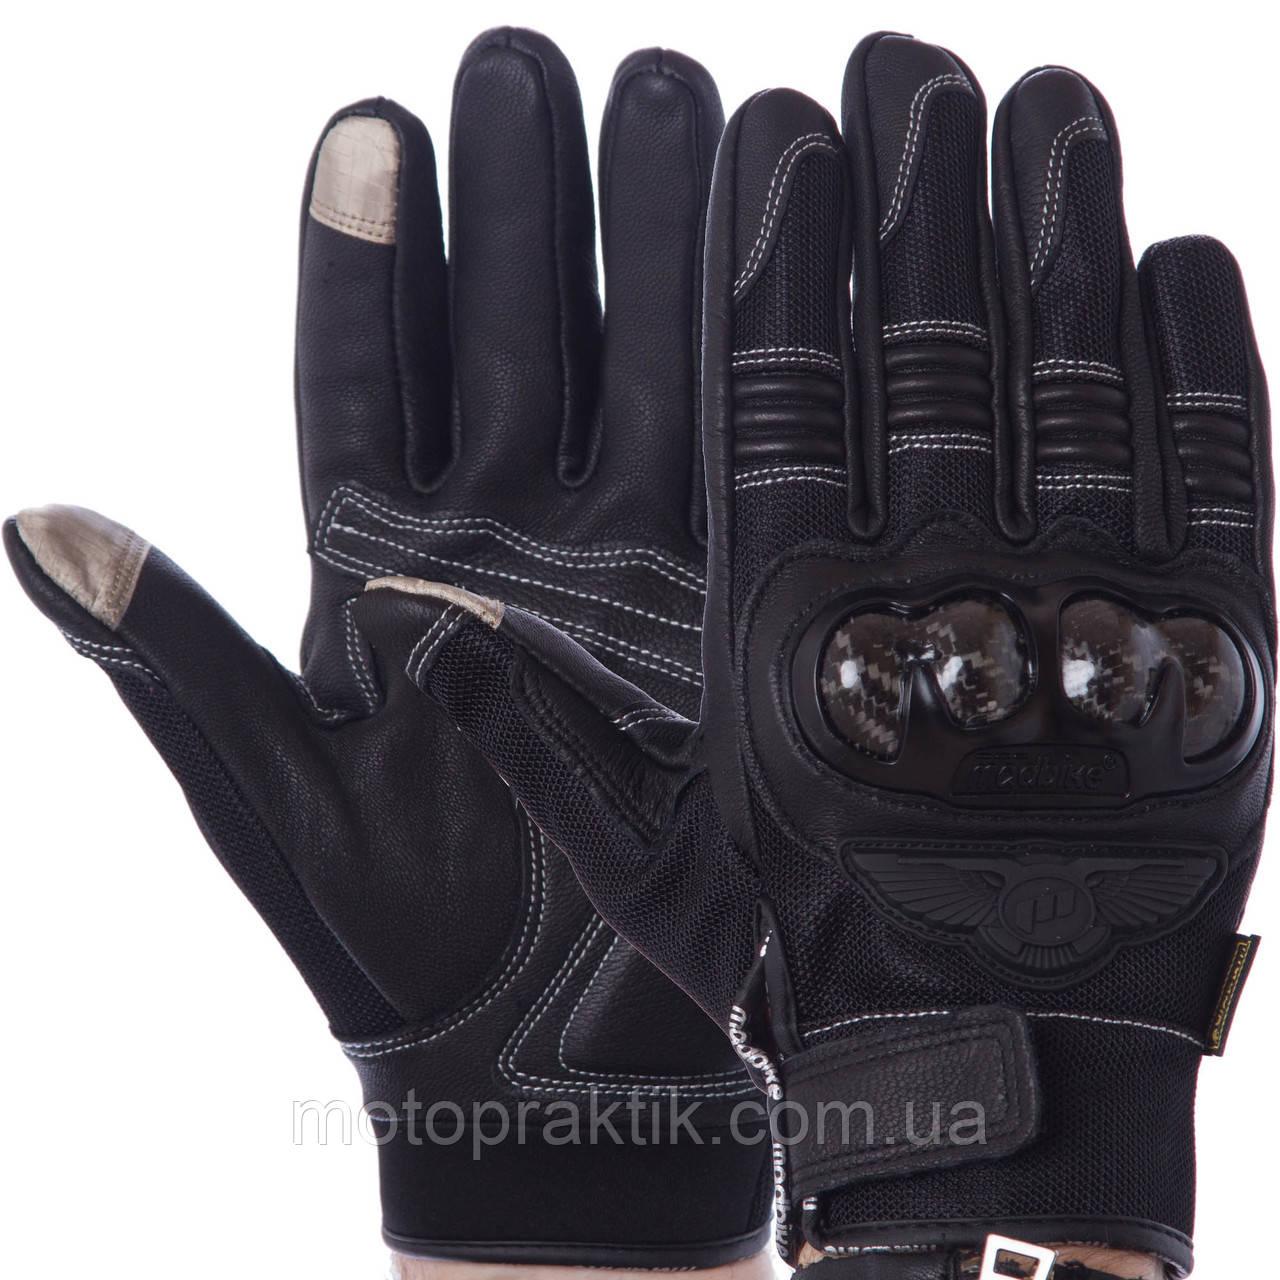 MADBIKE MAD-02 Gloves, Black, M, Мотоперчатки с защитой